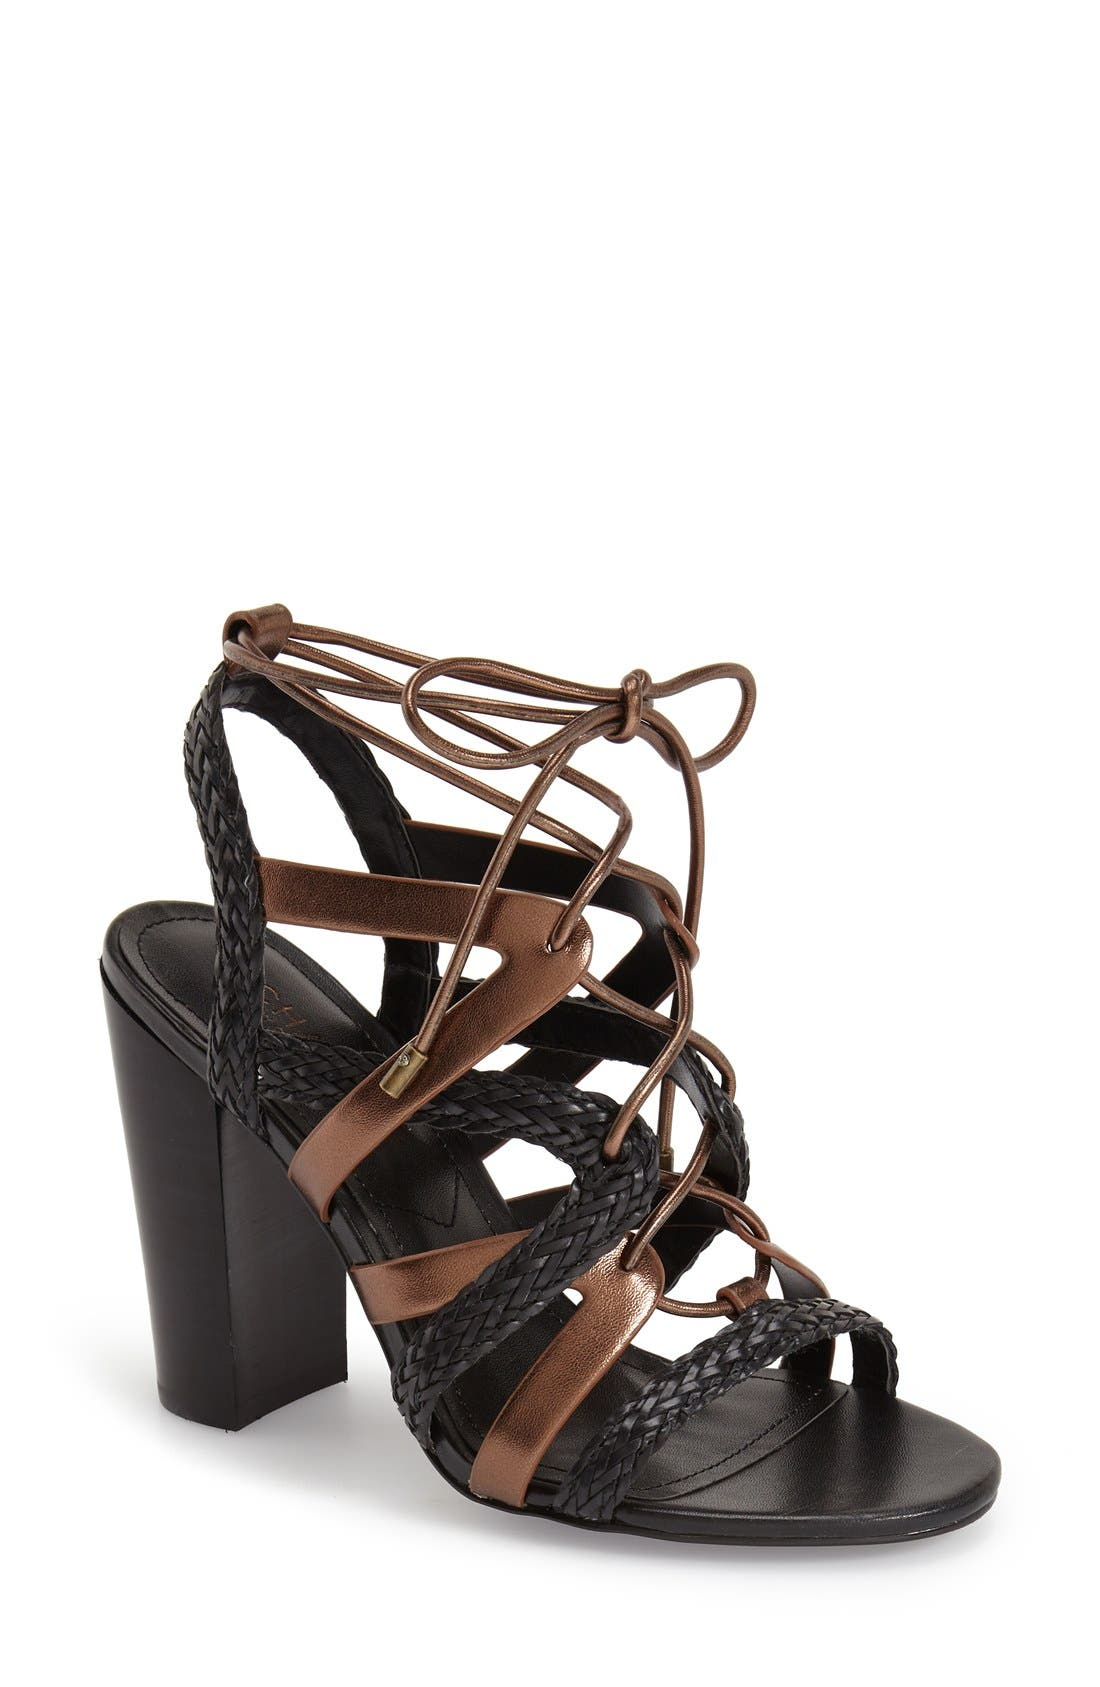 Alternate Image 1 Selected - Charles by Charles David 'Greensboro' Lace-Up Block Heel Sandal (Women)